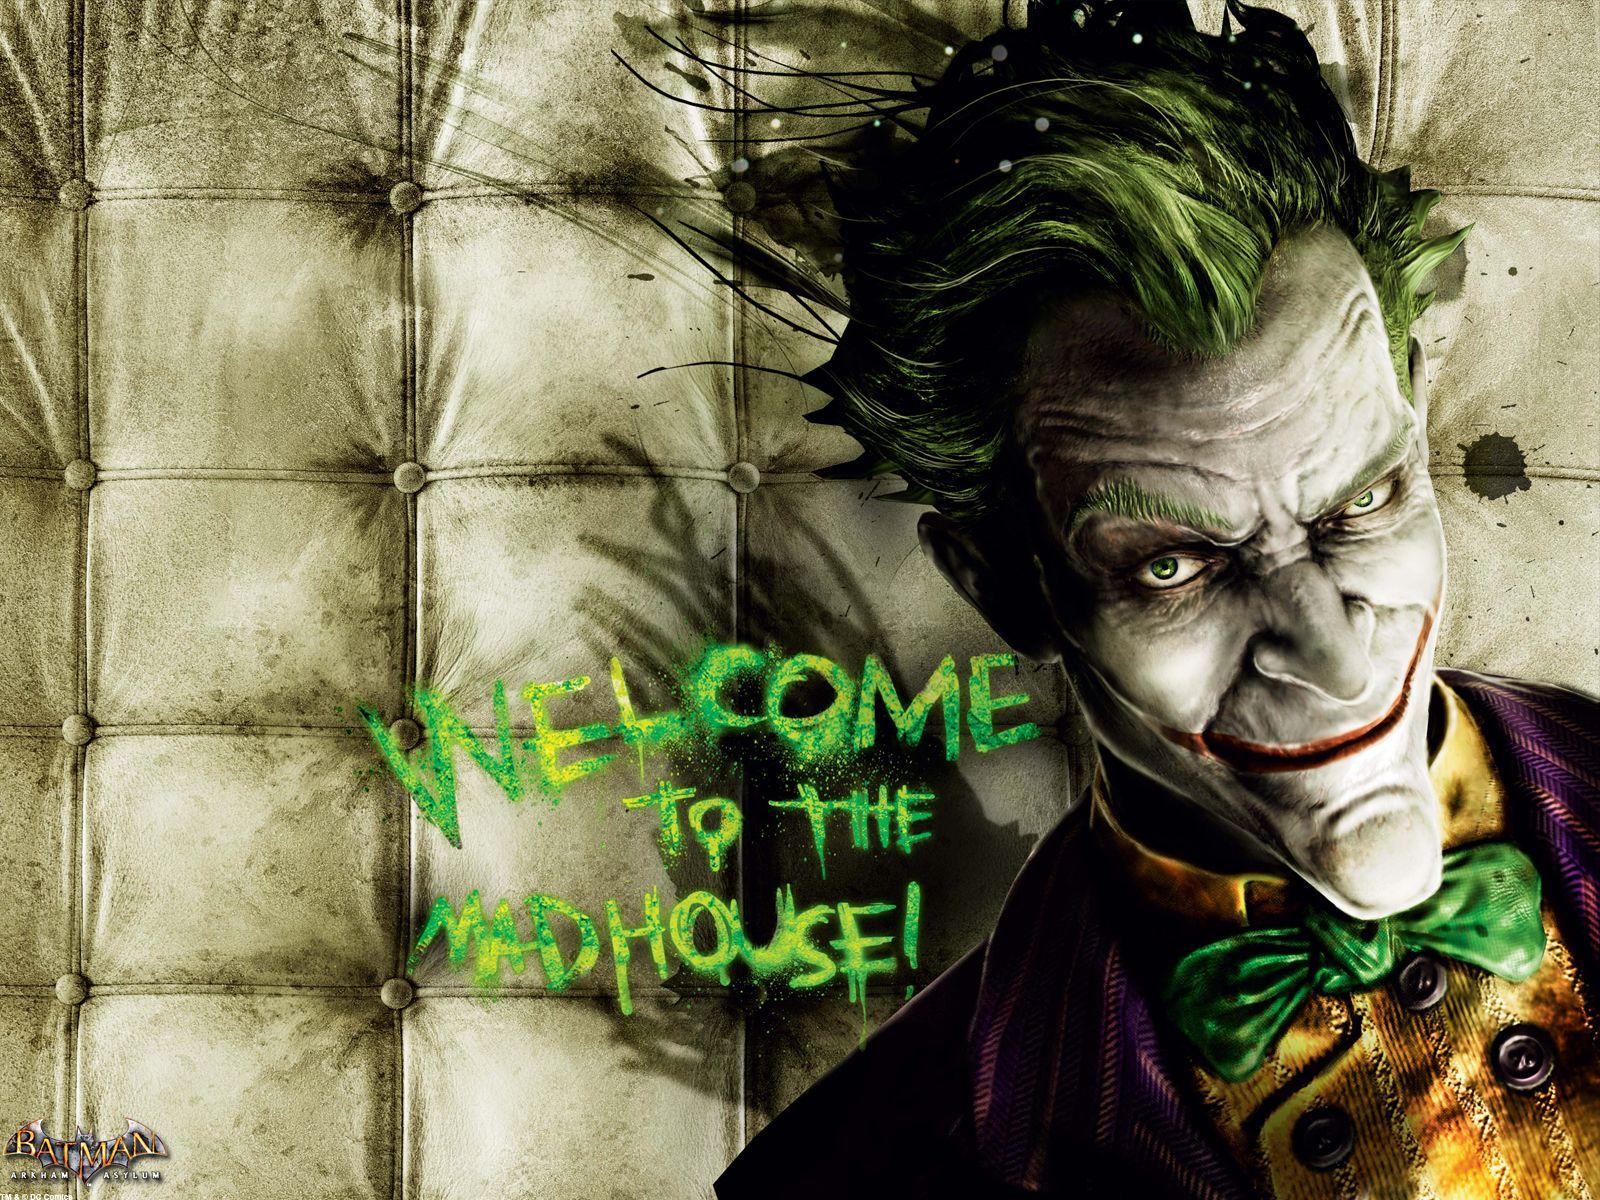 Top 20 The Joker Wallpapers In Hd Joker Wallpapers Joker Comic Joker Artwork